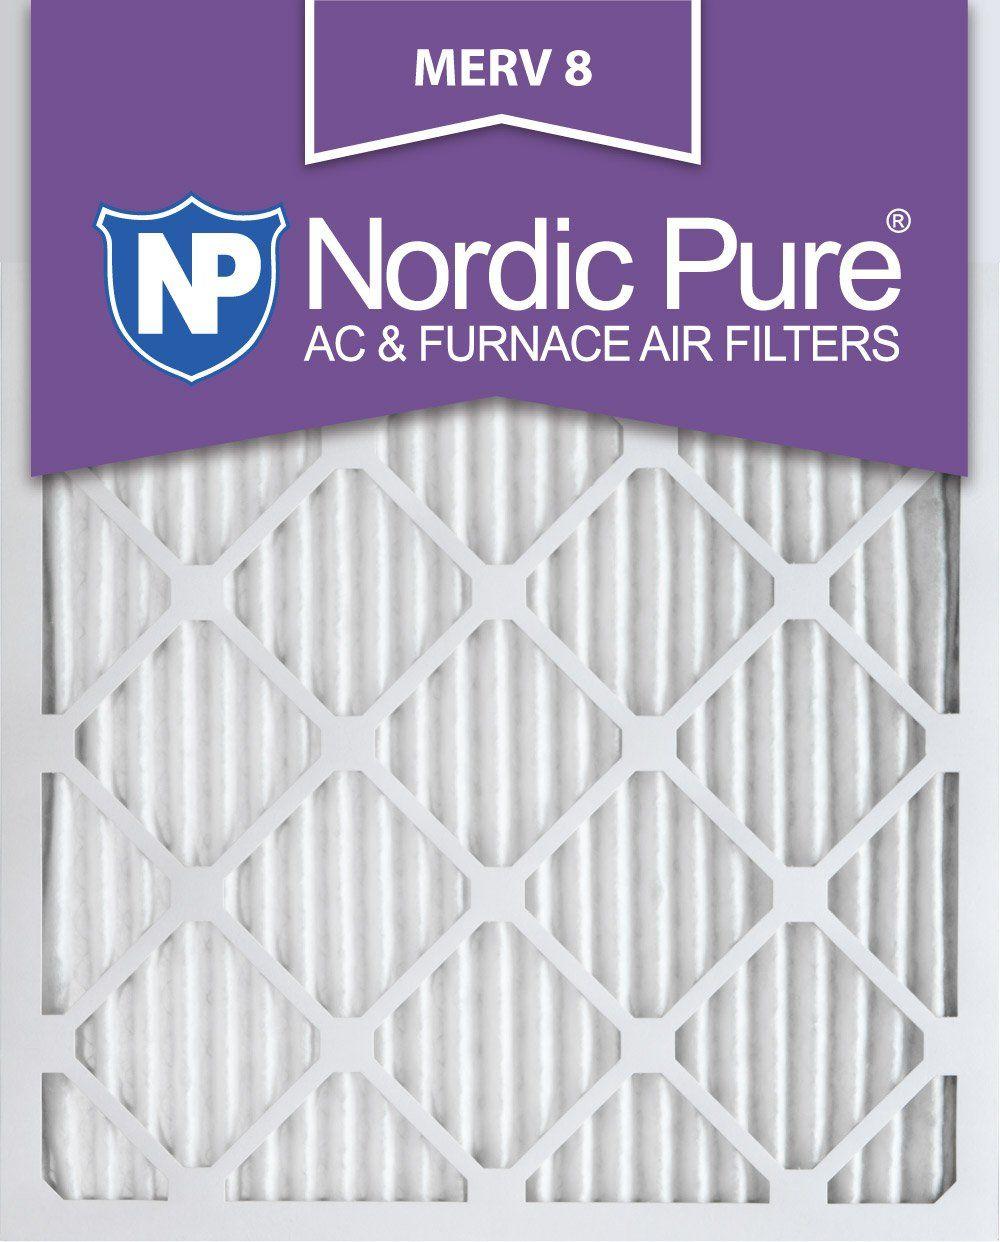 Nordic Pure 20x25x1M86 MERV 8 Pleated AC Furnace Air